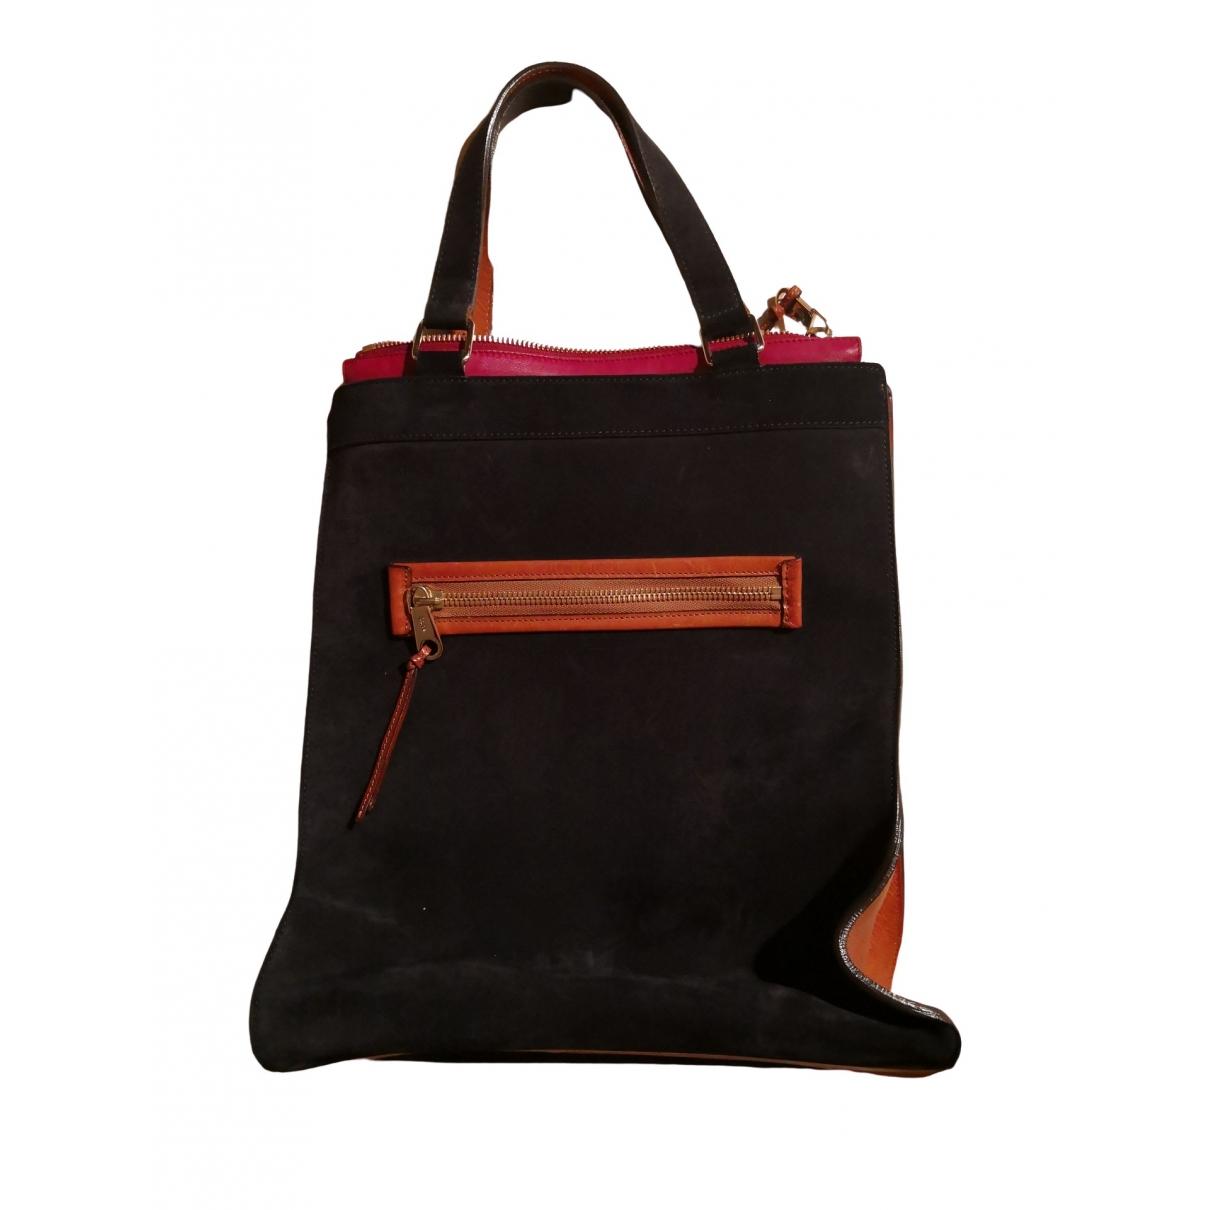 Chloé \N Blue Suede handbag for Women \N